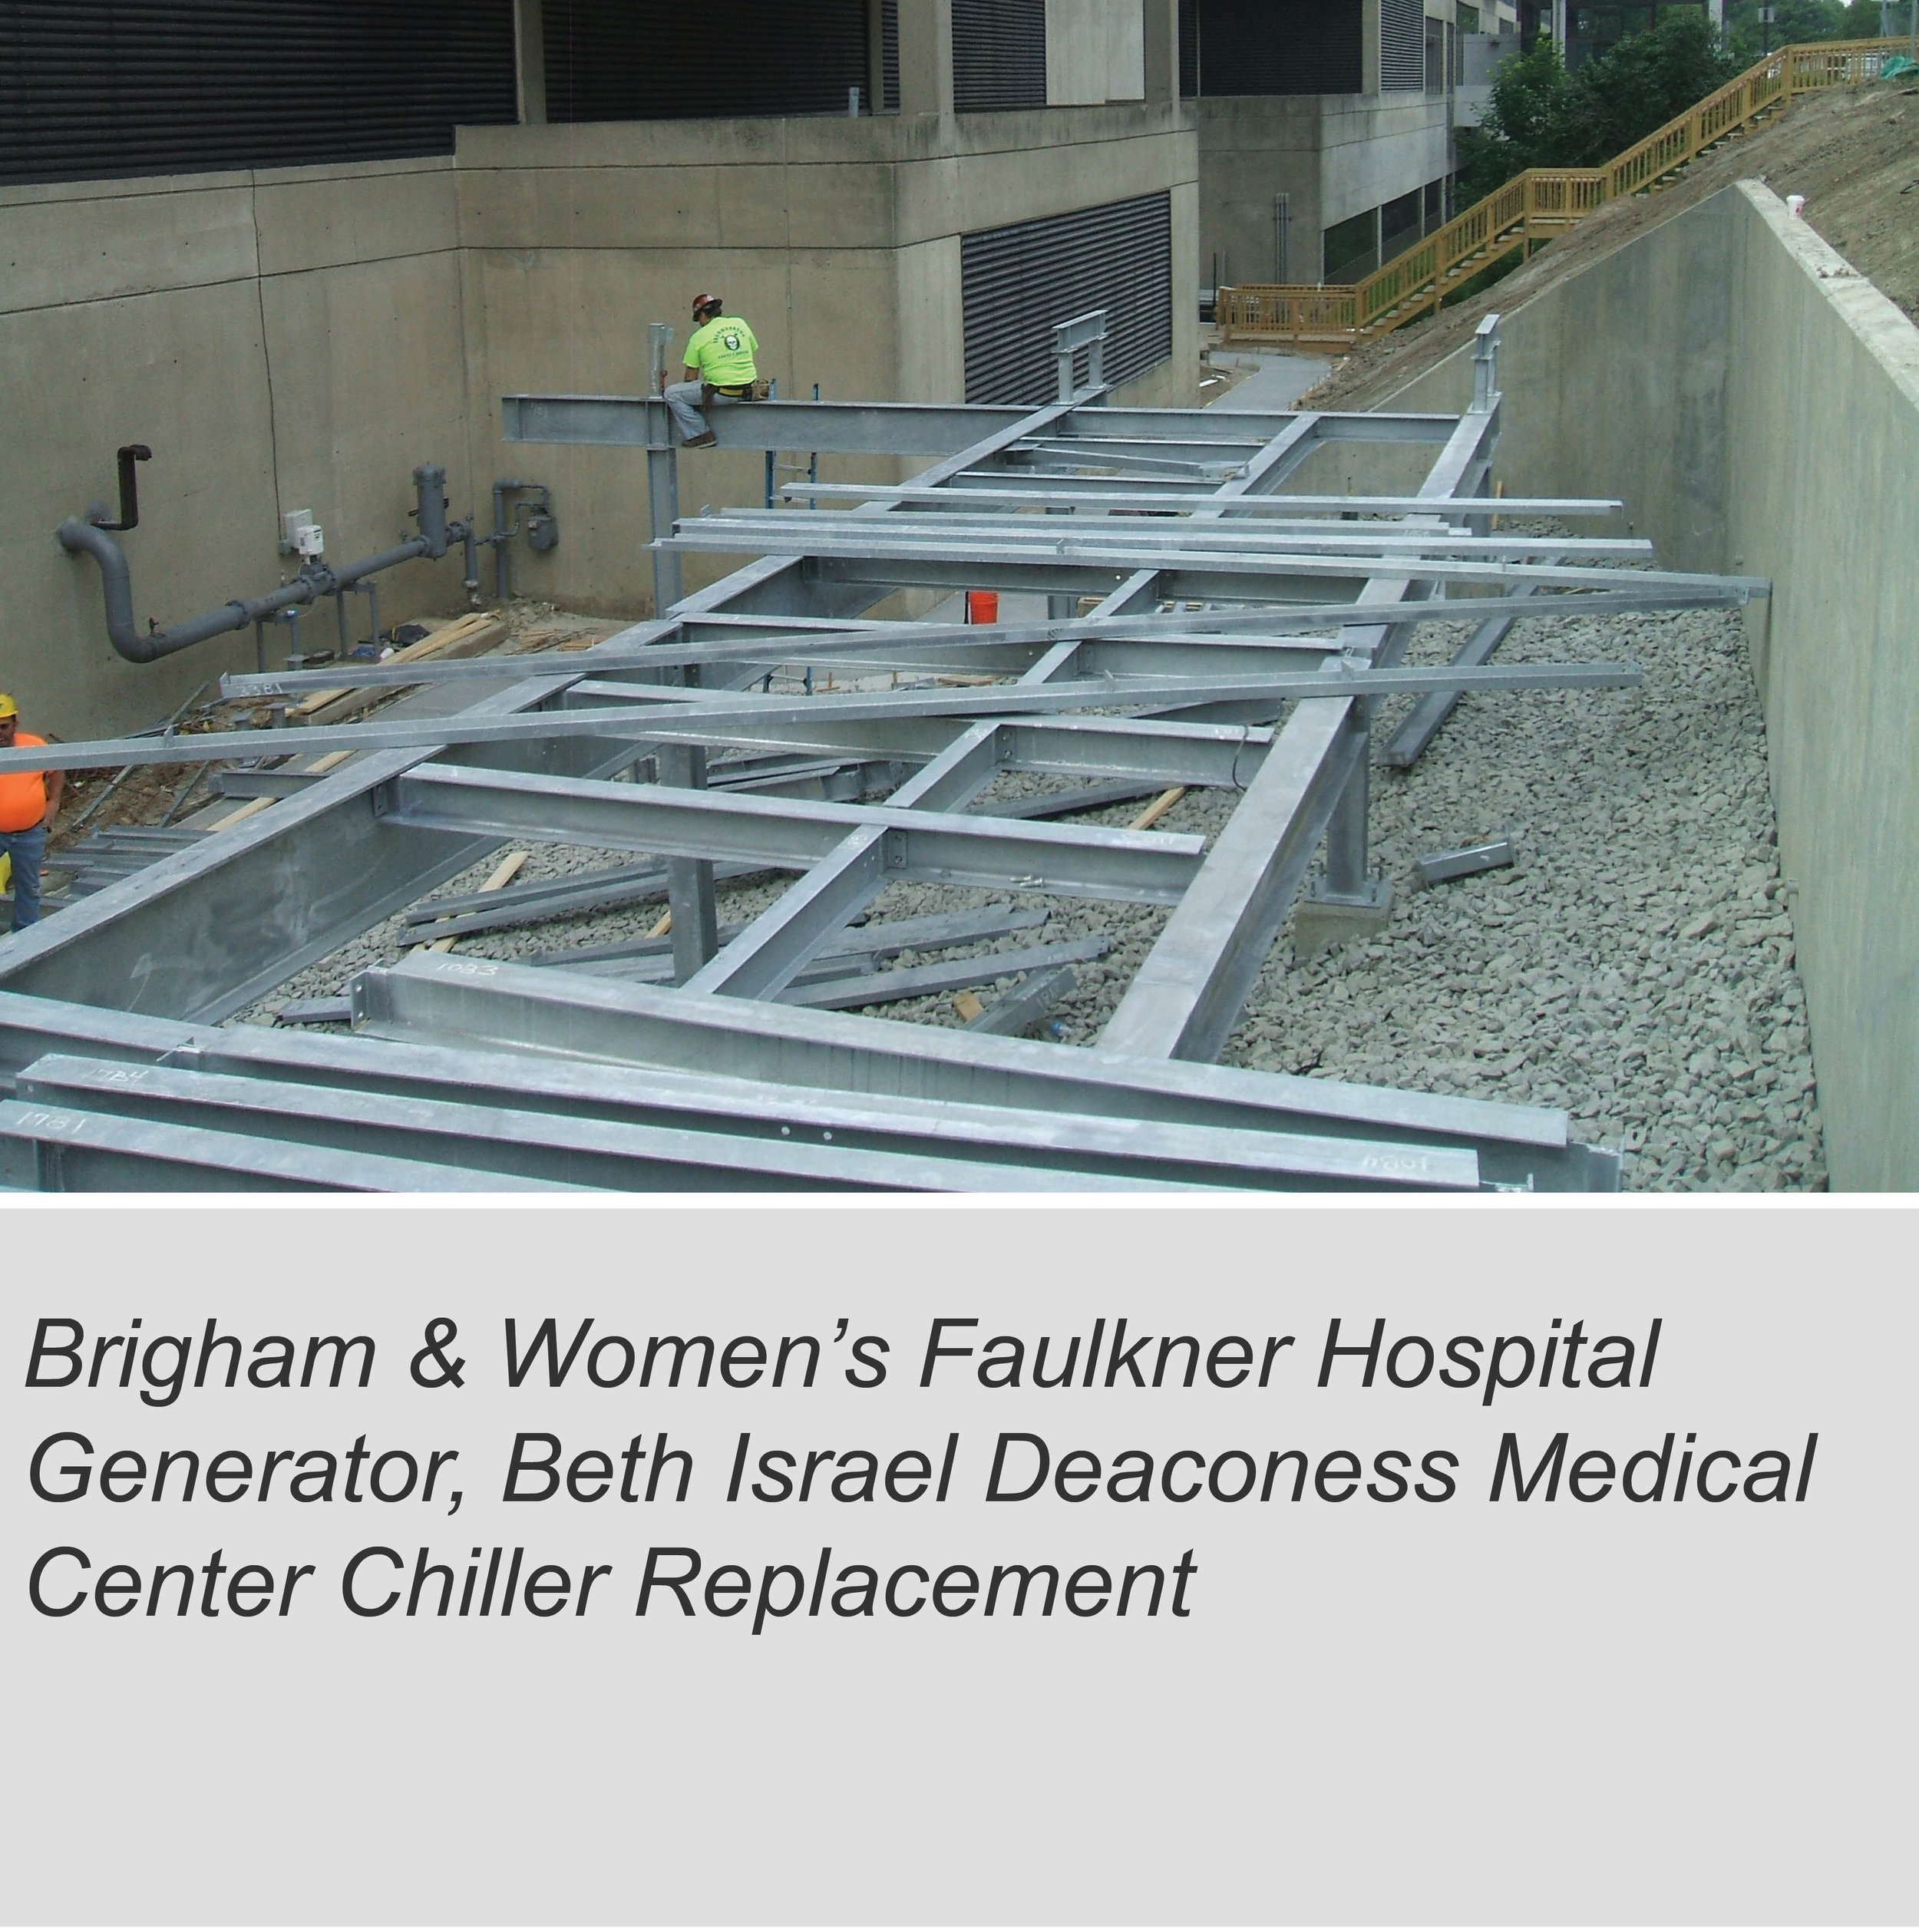 BWFH-GeneratorChiller.jpg